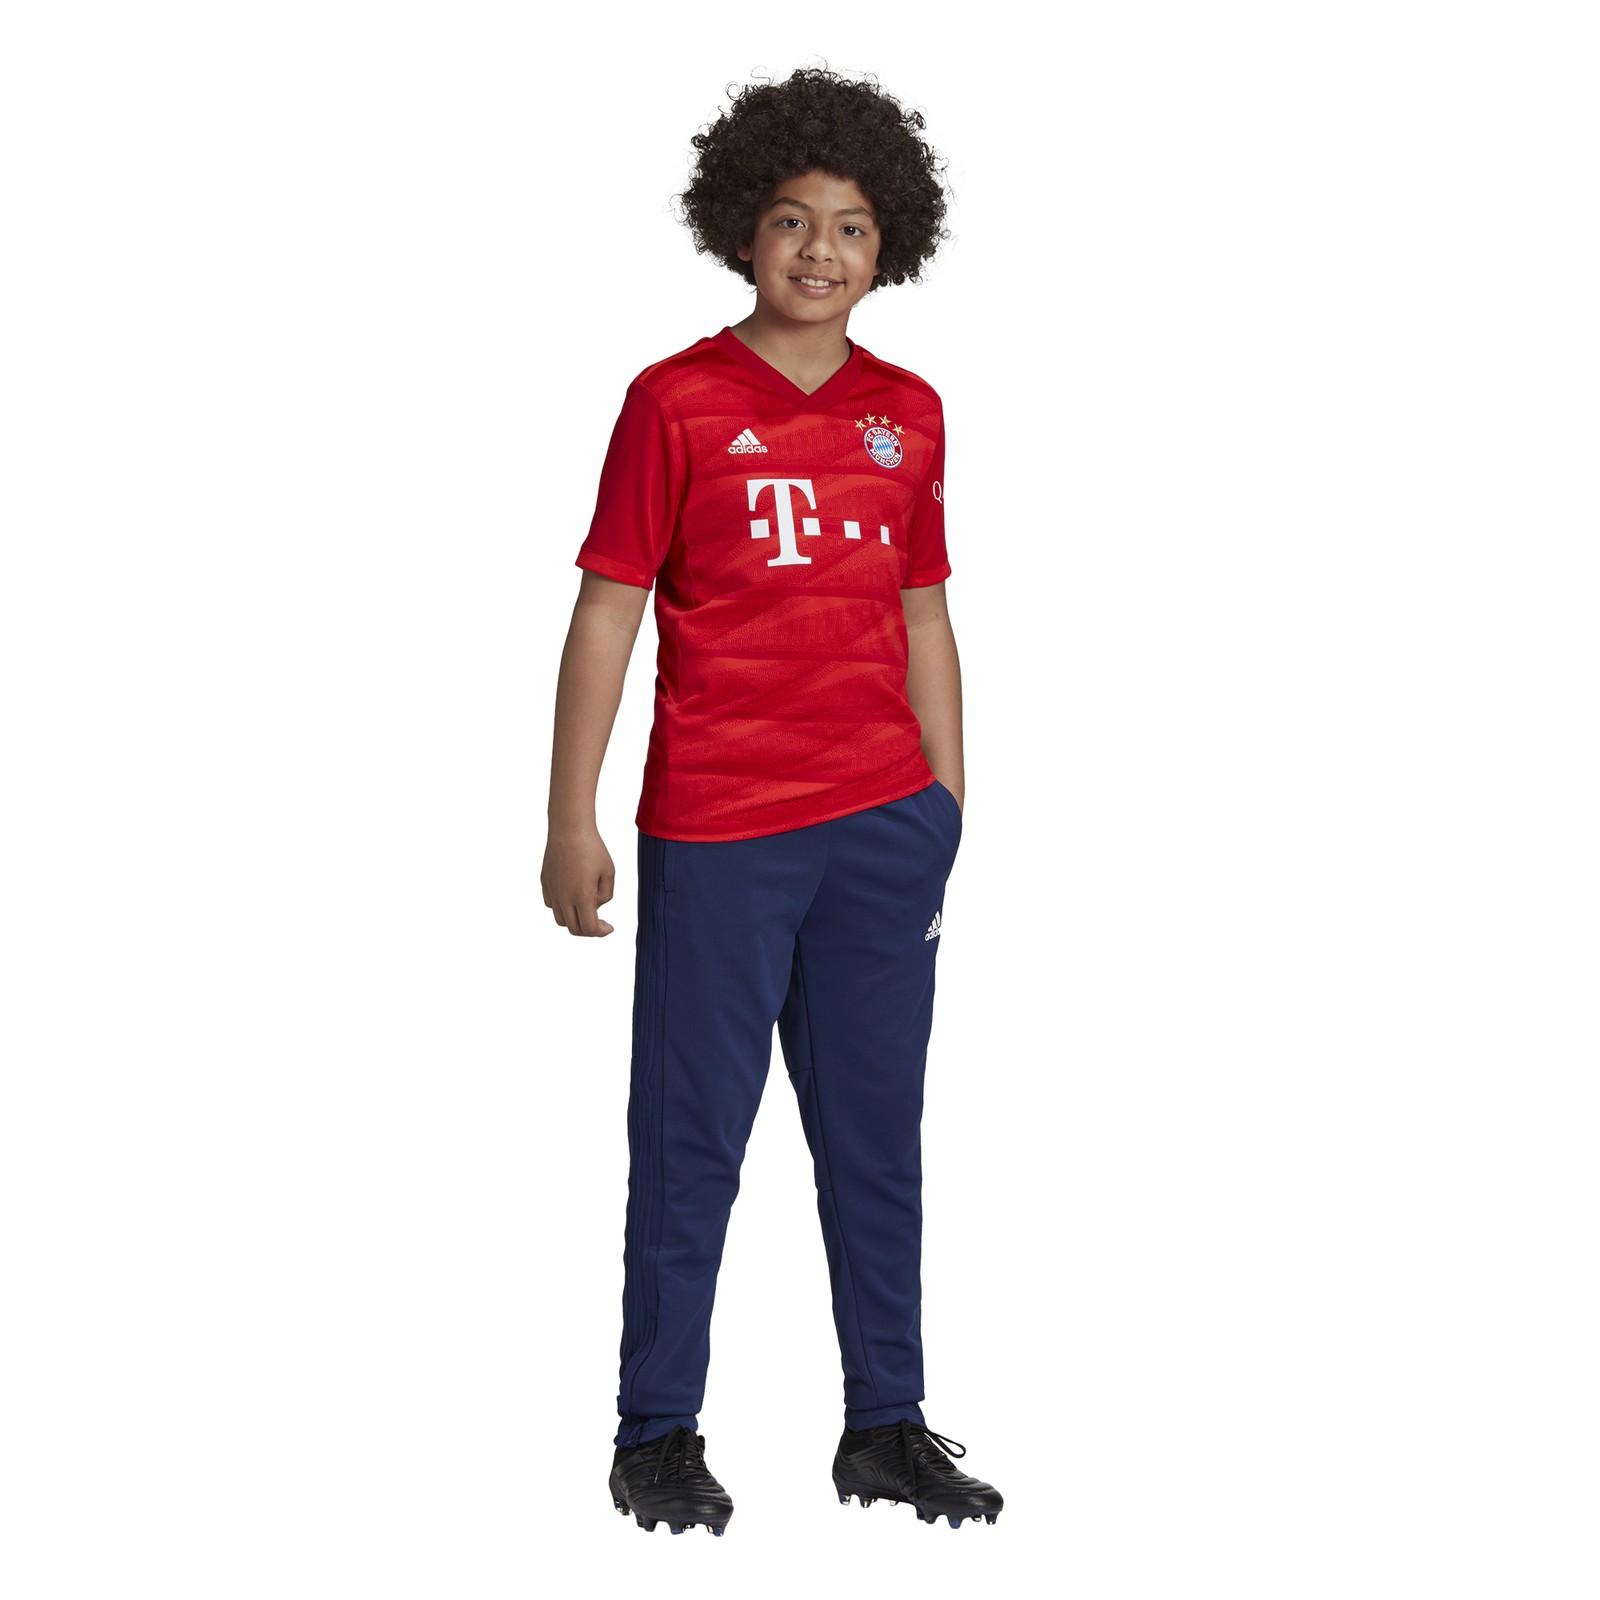 adidas-FC-Bayern-Muenchen-Heimtrikot-Kinder-2019-2020-Home-Jersey-rot-DX9253 Indexbild 18